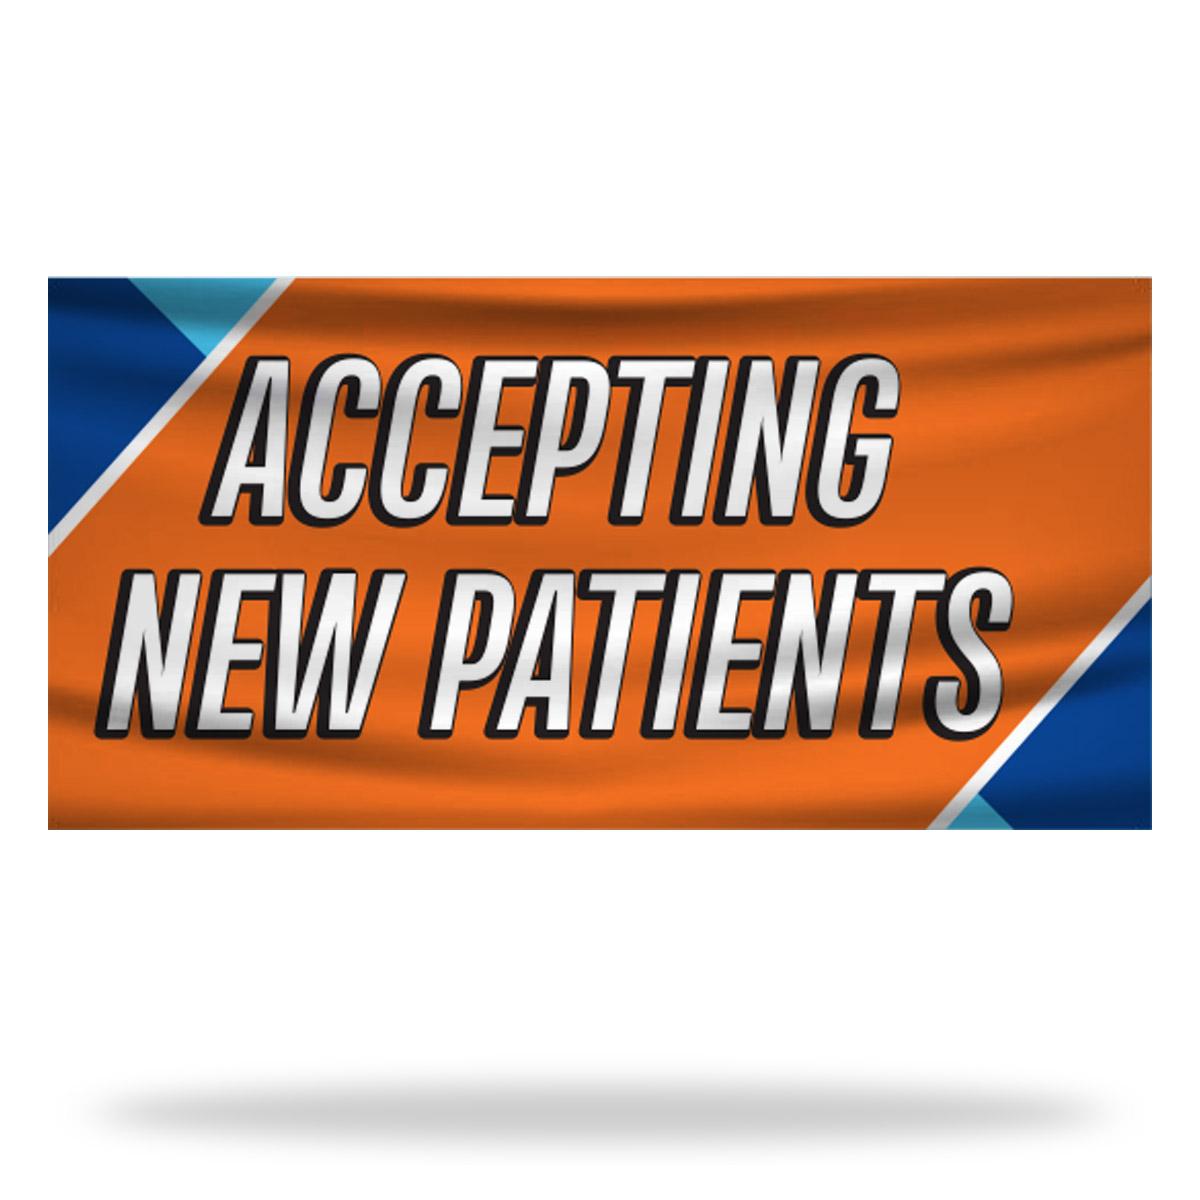 Patients Flags & Banners Design 01